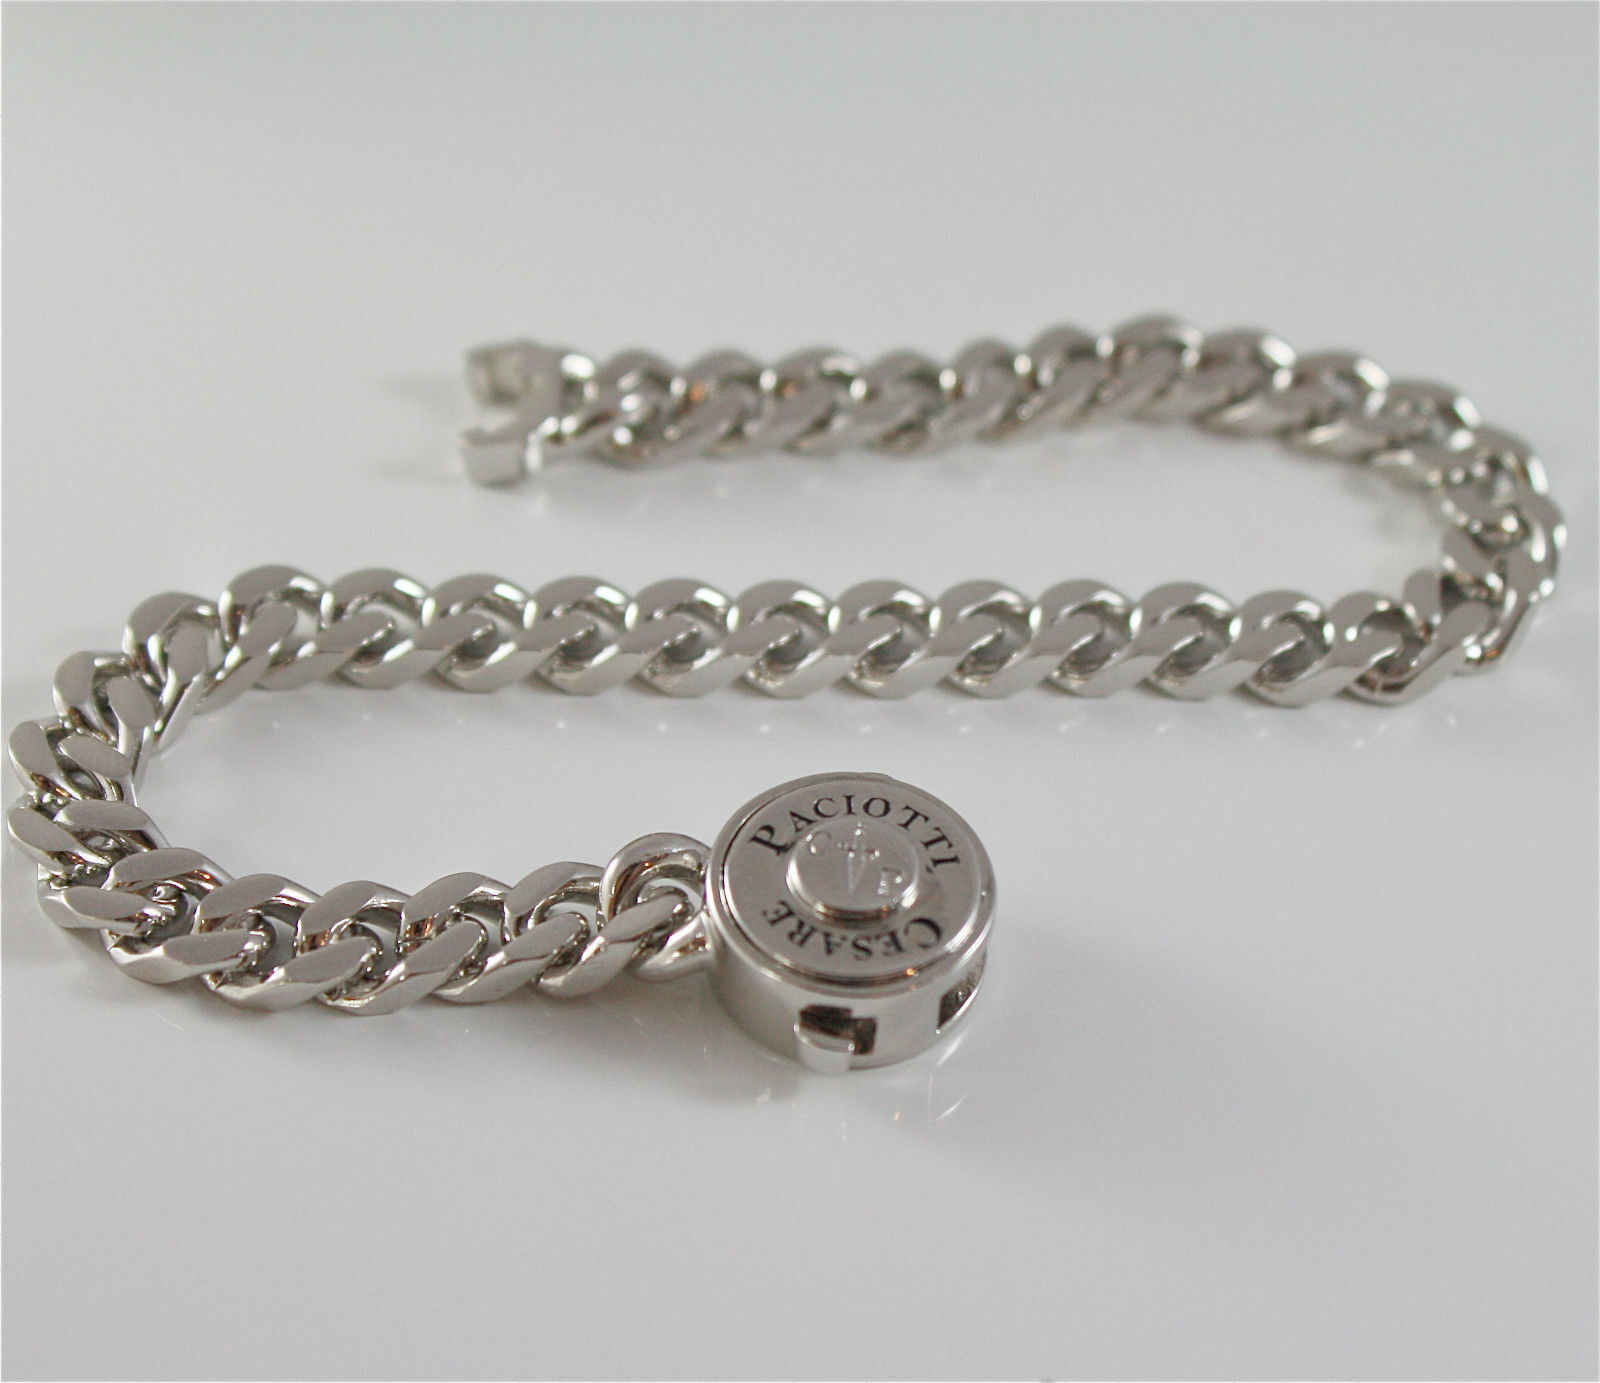 Bracelet Cesare Paciotti 925 Silver & Steel Top Groumette JPBR1269B